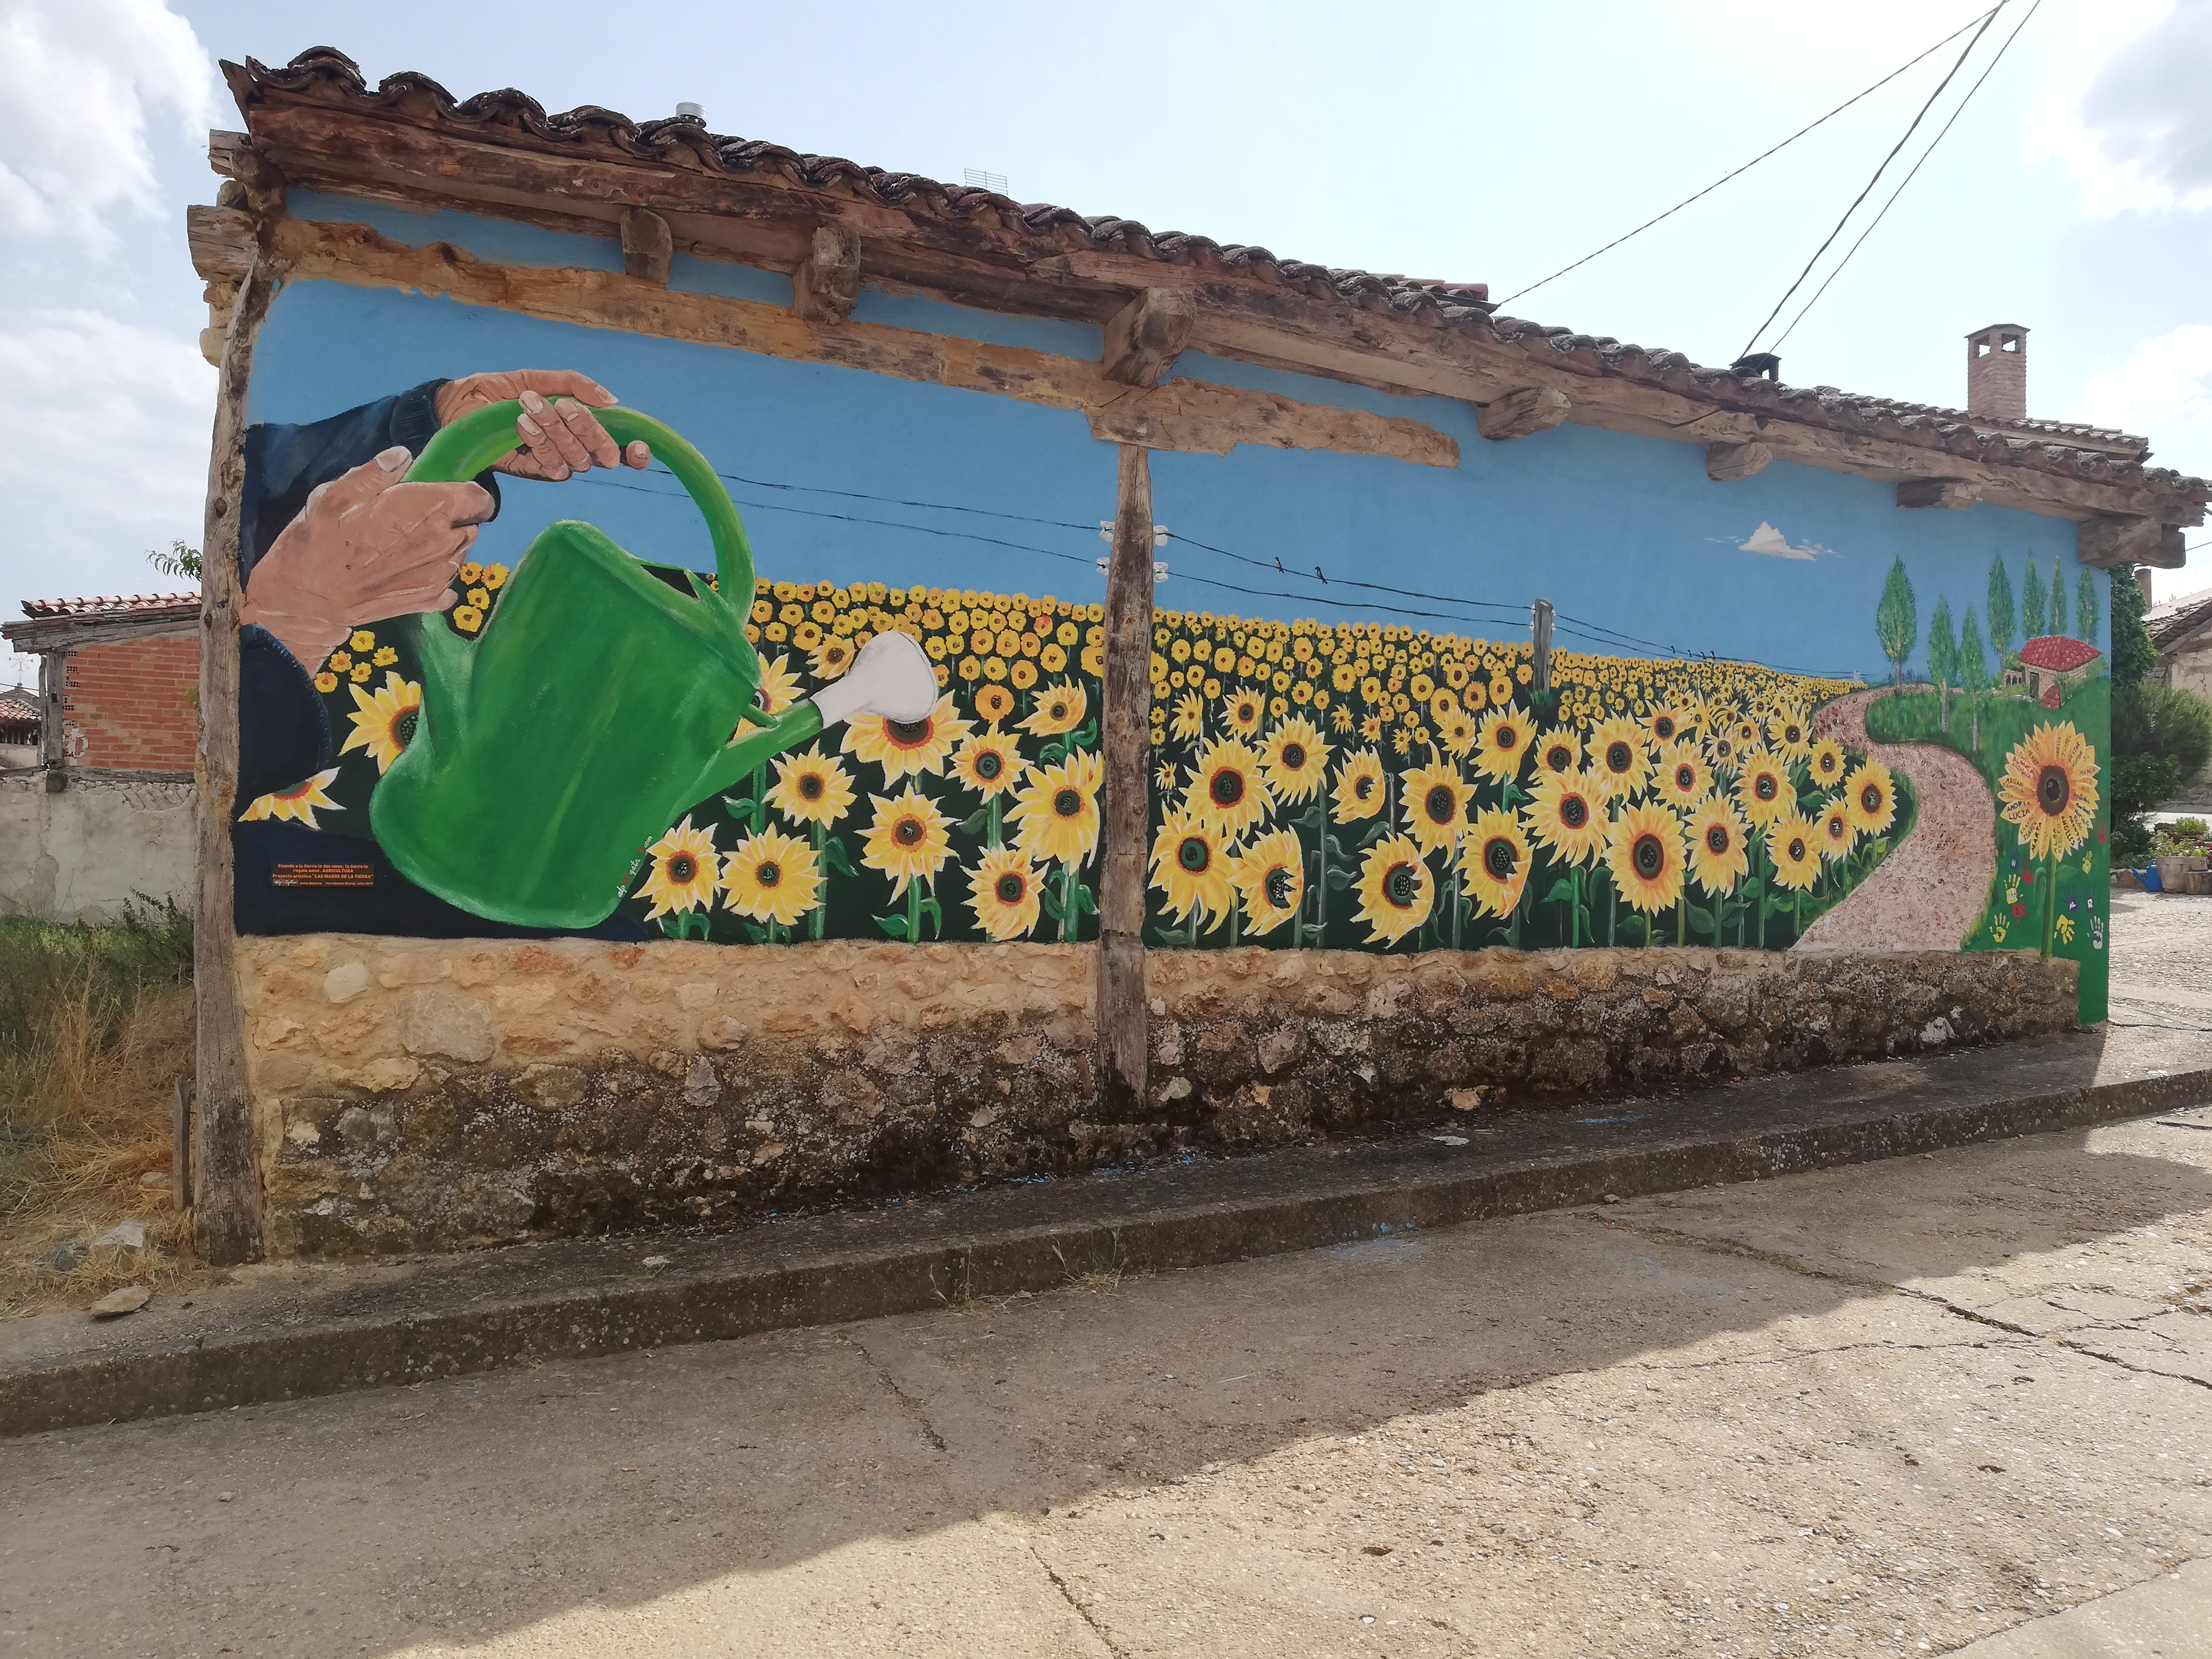 las-manos-de-la-tierra-torreblacos-julita-romera-alpartgata (89)